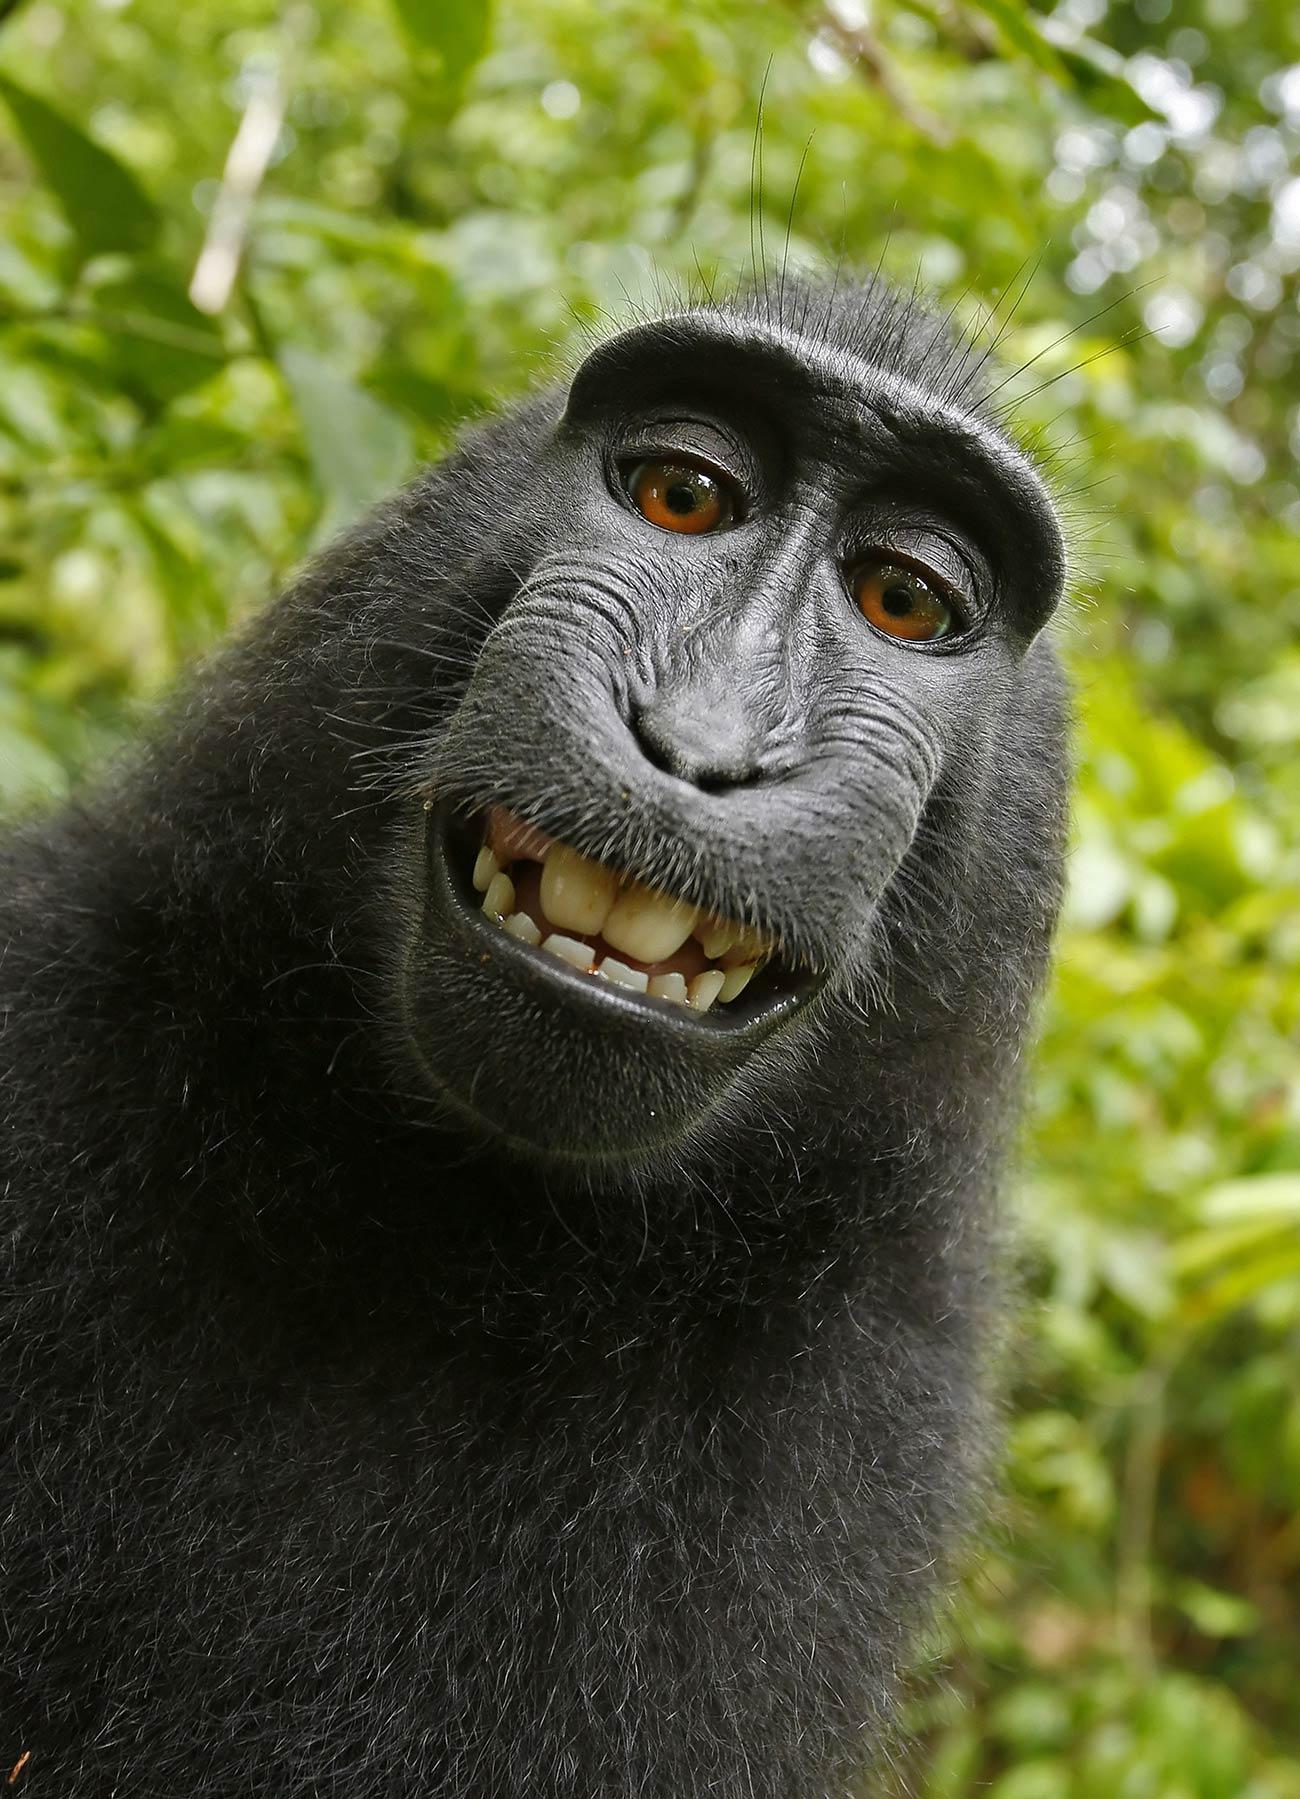 David Slater: Crested Black Macaque